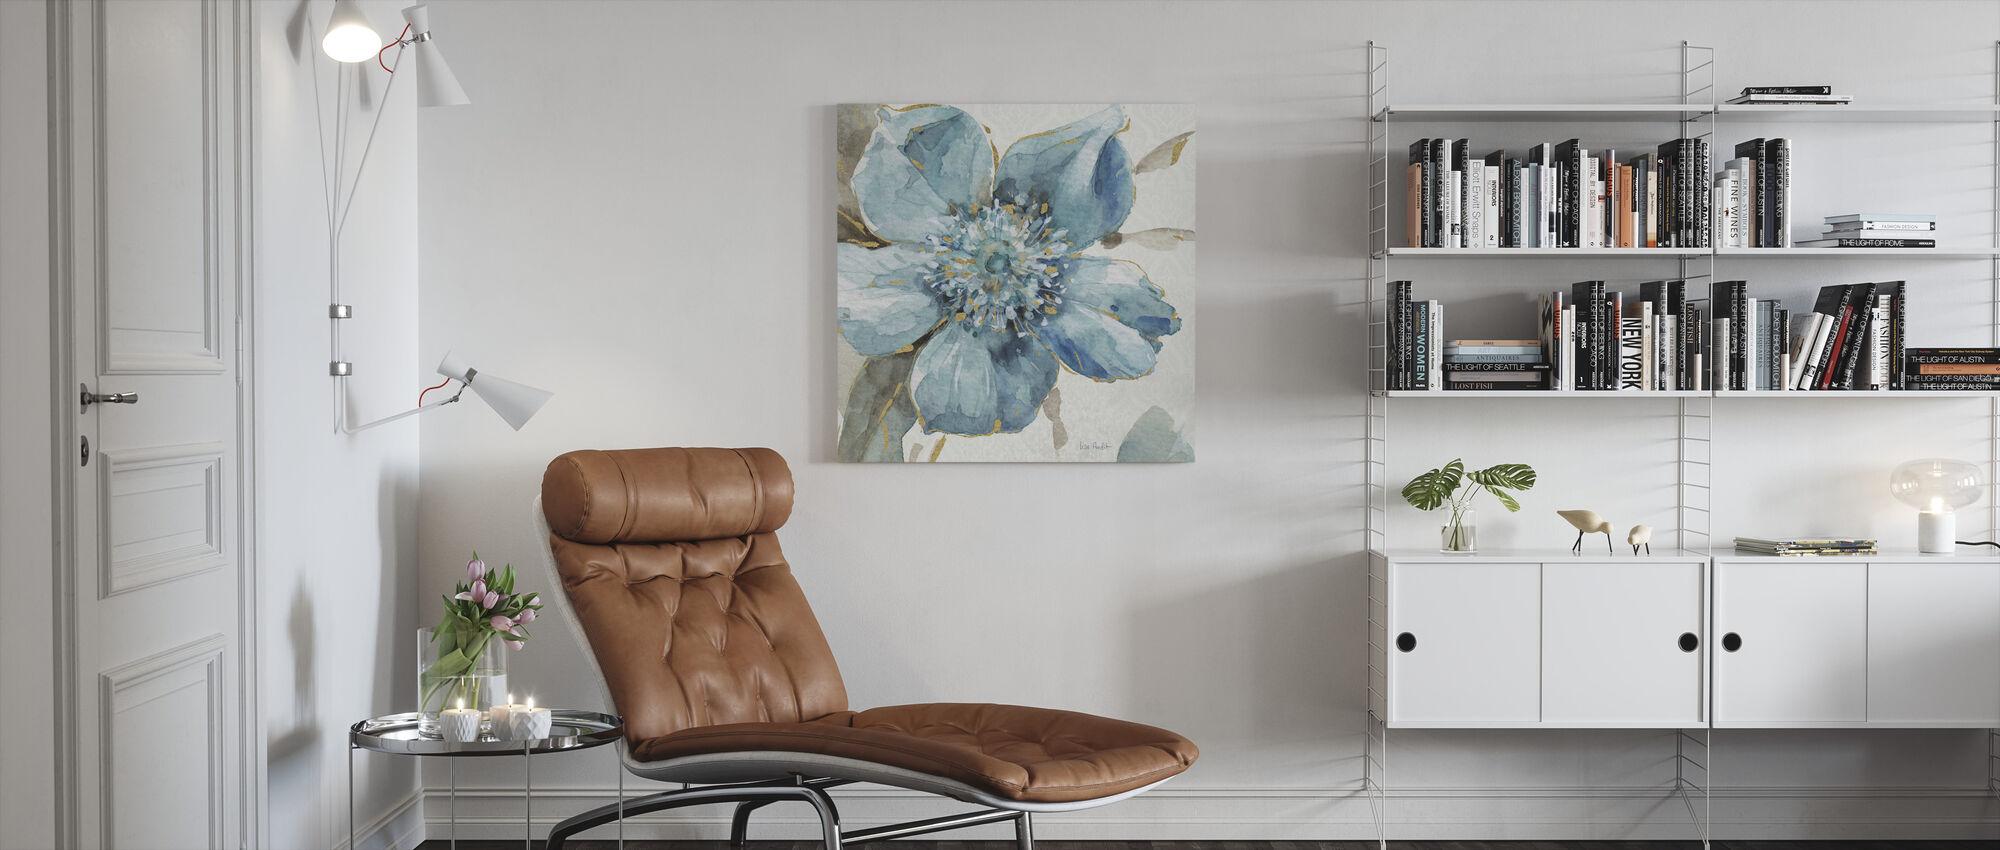 Indigold Floral 2 - Canvas print - Living Room